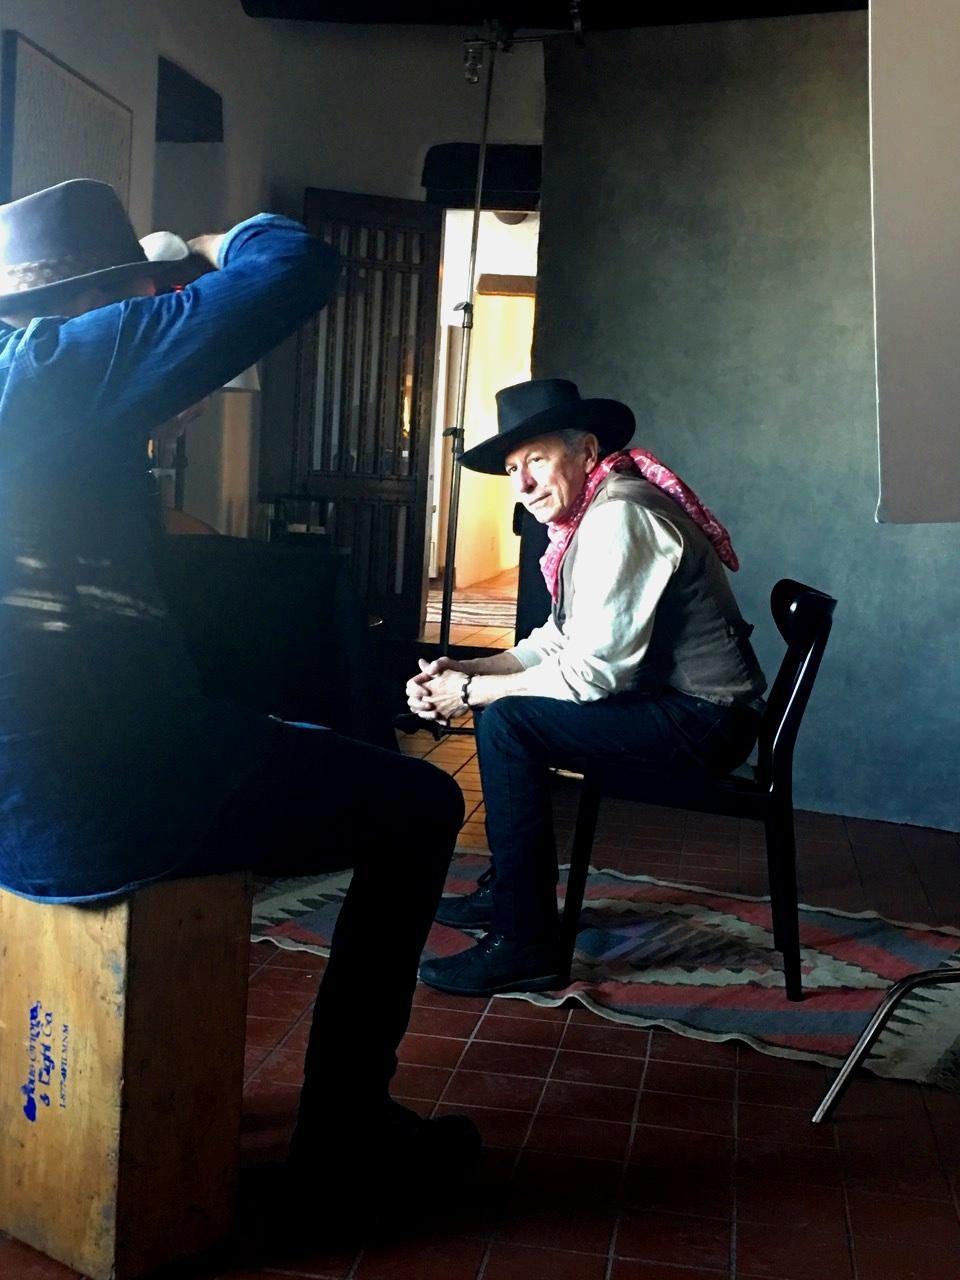 Danny Clinch and Joe Ely, El Rey Hotel, Santa Fe, NM 2019